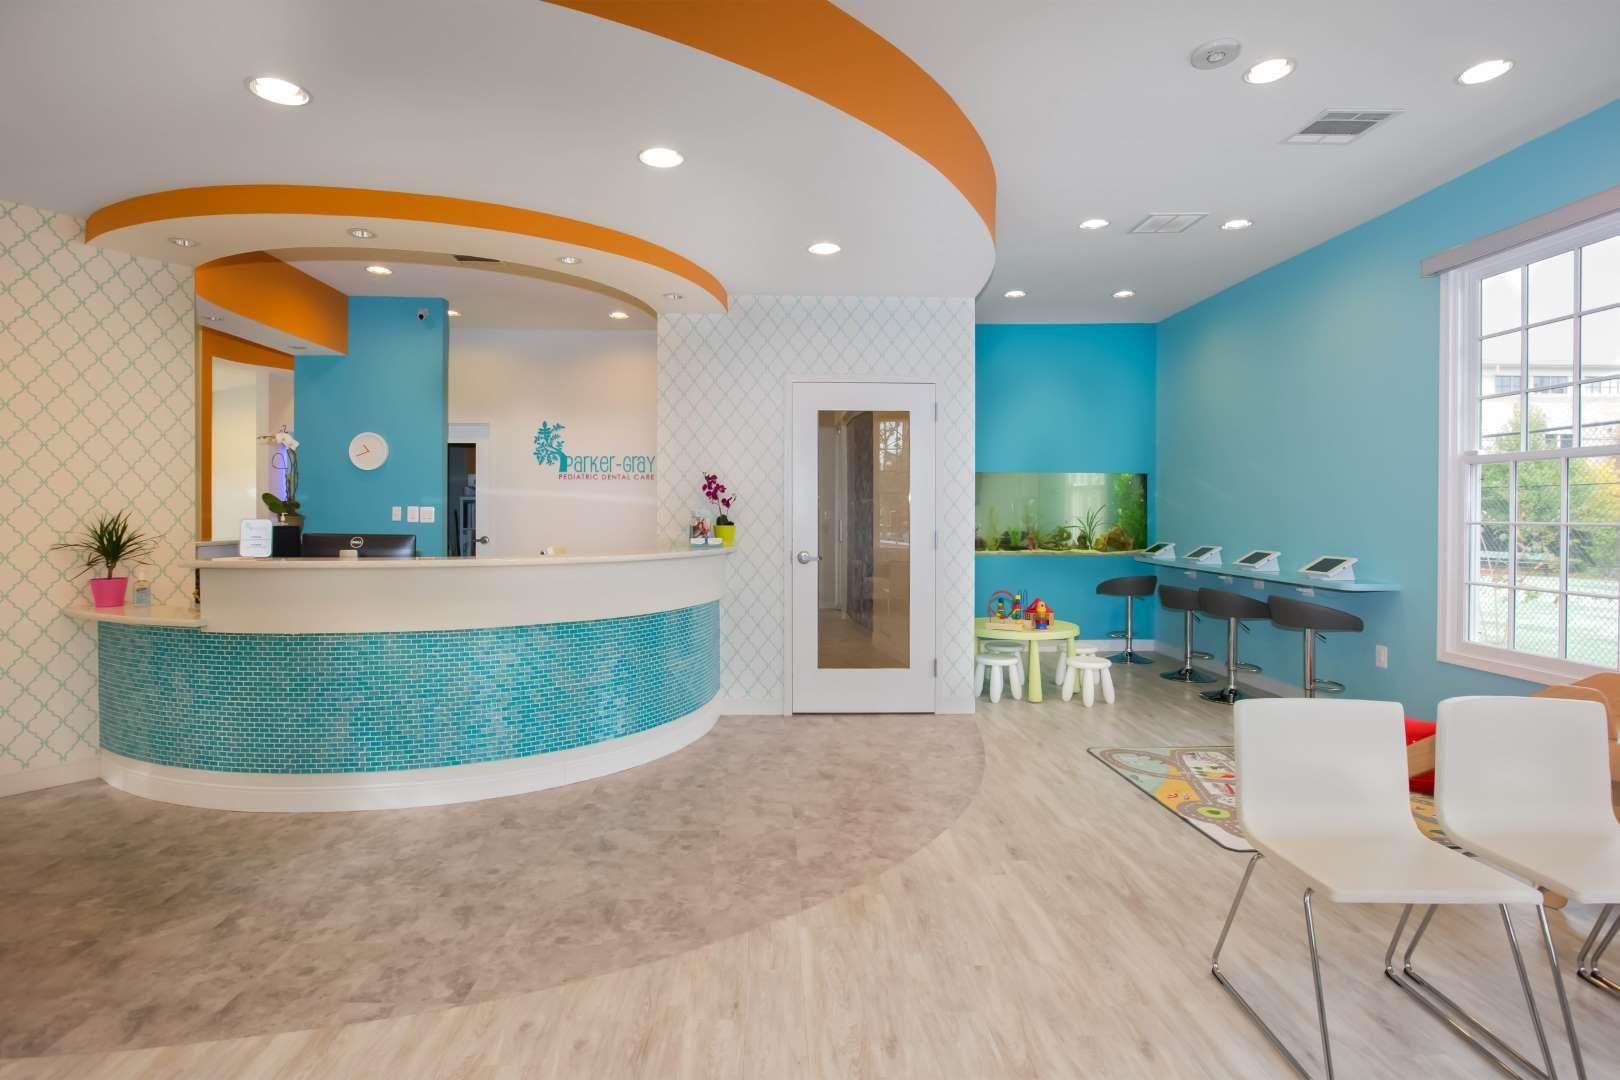 Parker-Gray Pediatric Dental Care Reception Area Design #dentalcare